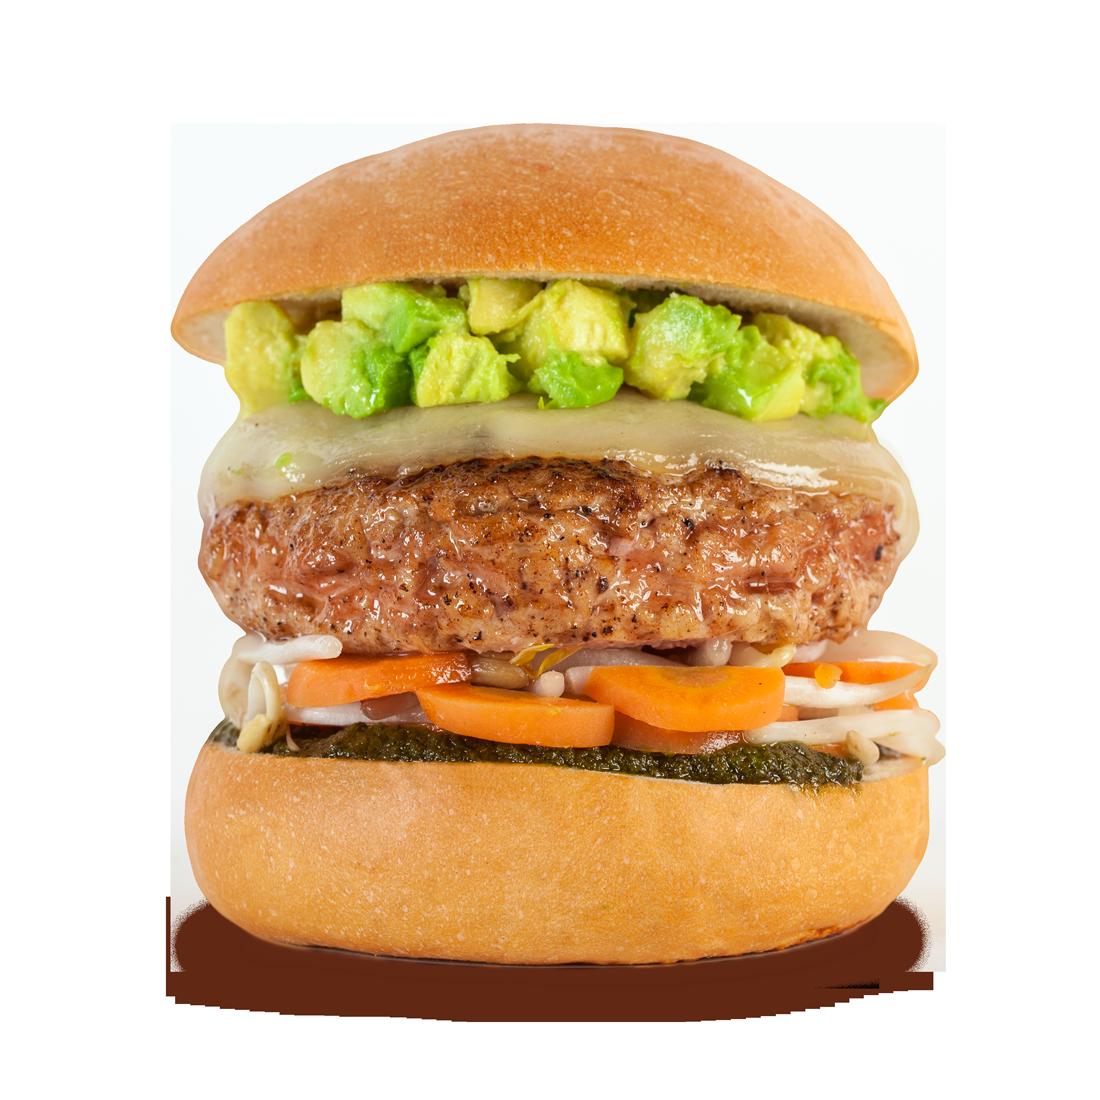 Hand burgers sandwiches menu. Hamburger clipart american burger